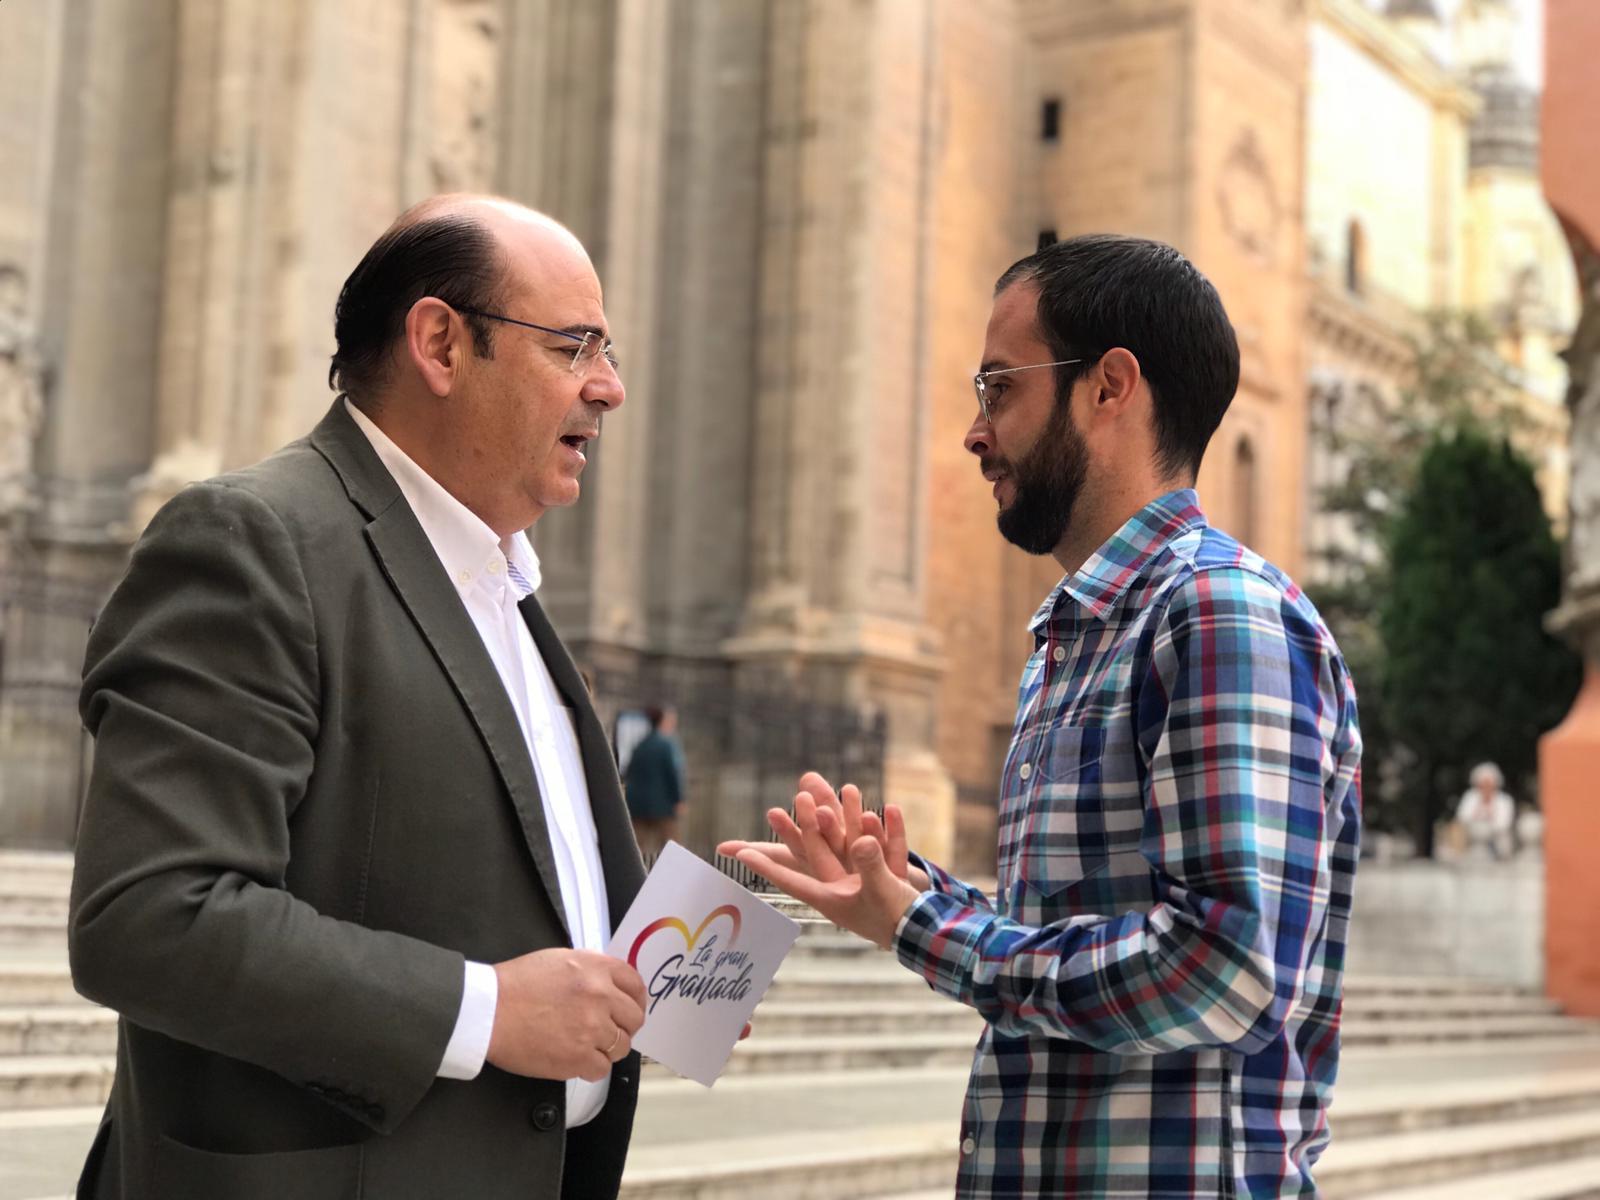 #26M: Sebastián Pérez presenta un plan para «llenar las calles de todo tipo de música»